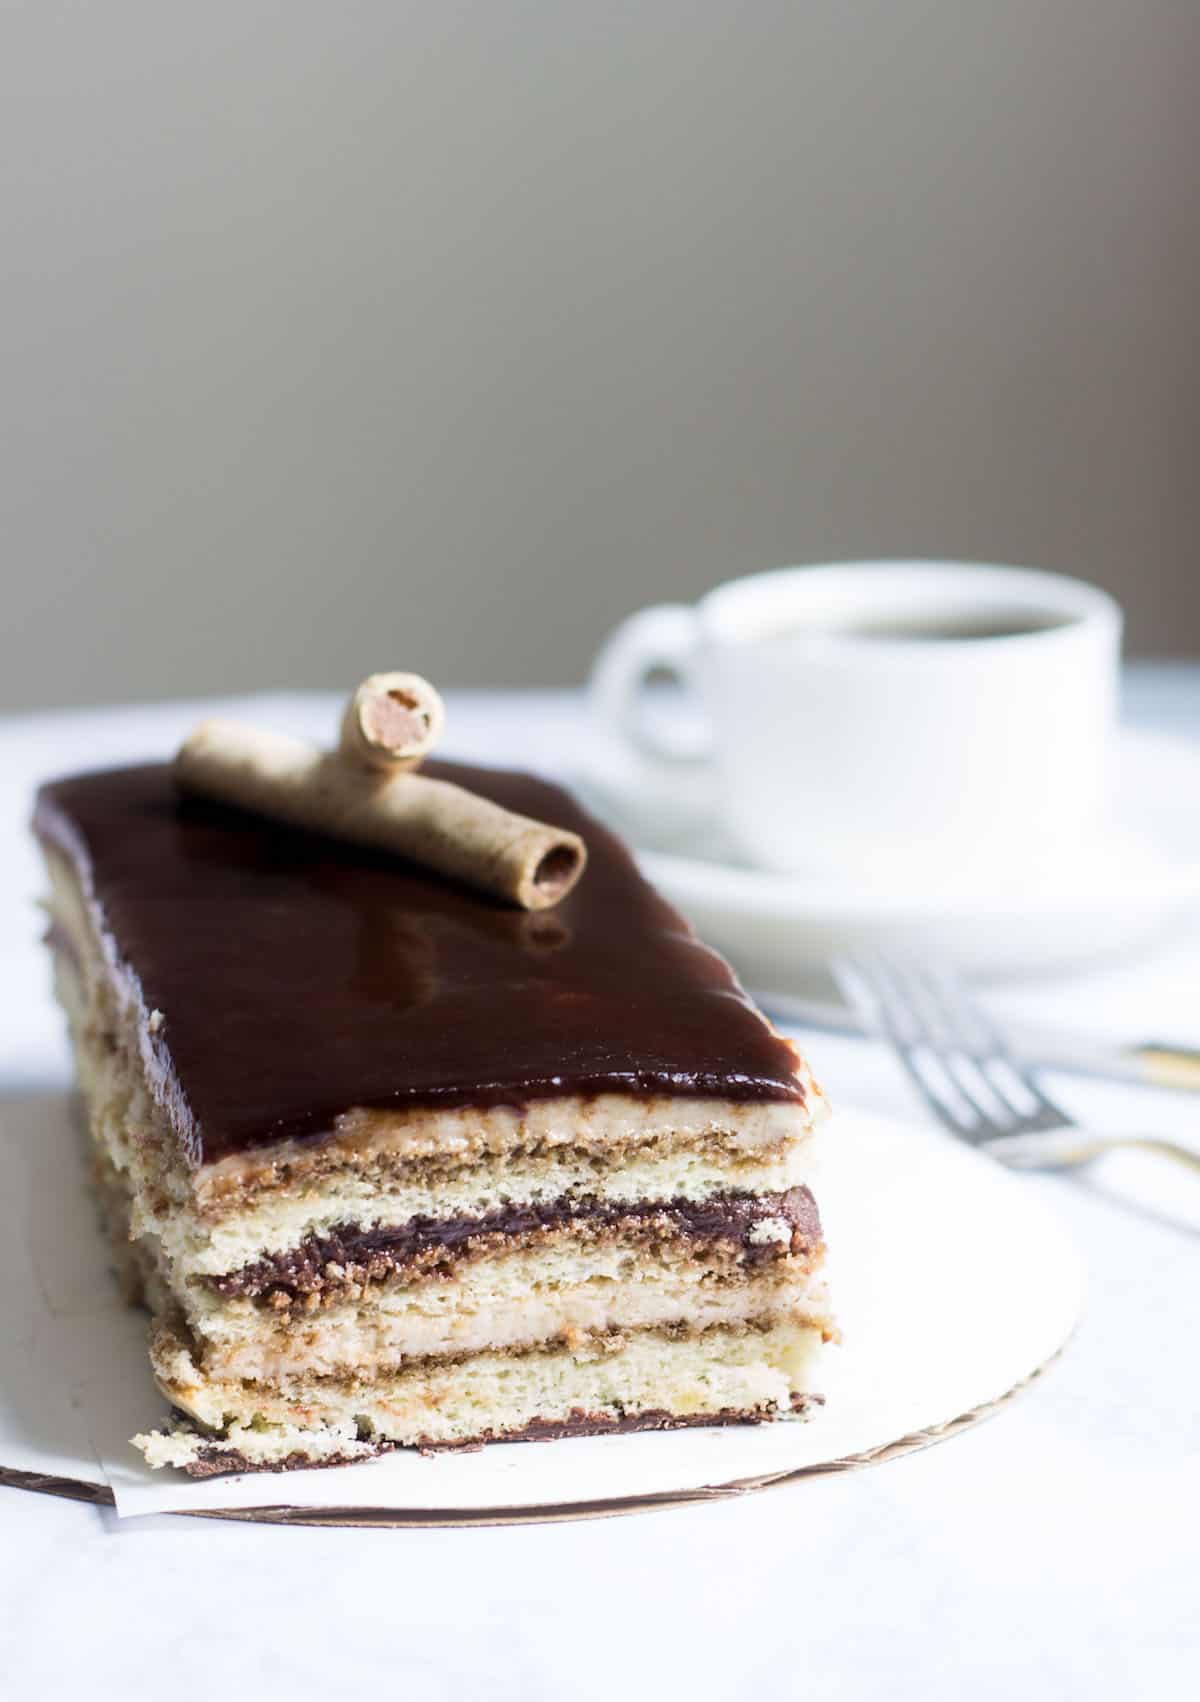 Opera Cake Made Easy! Create this beautiful and delicious coffee-flavored cake via MonPetitFour.com